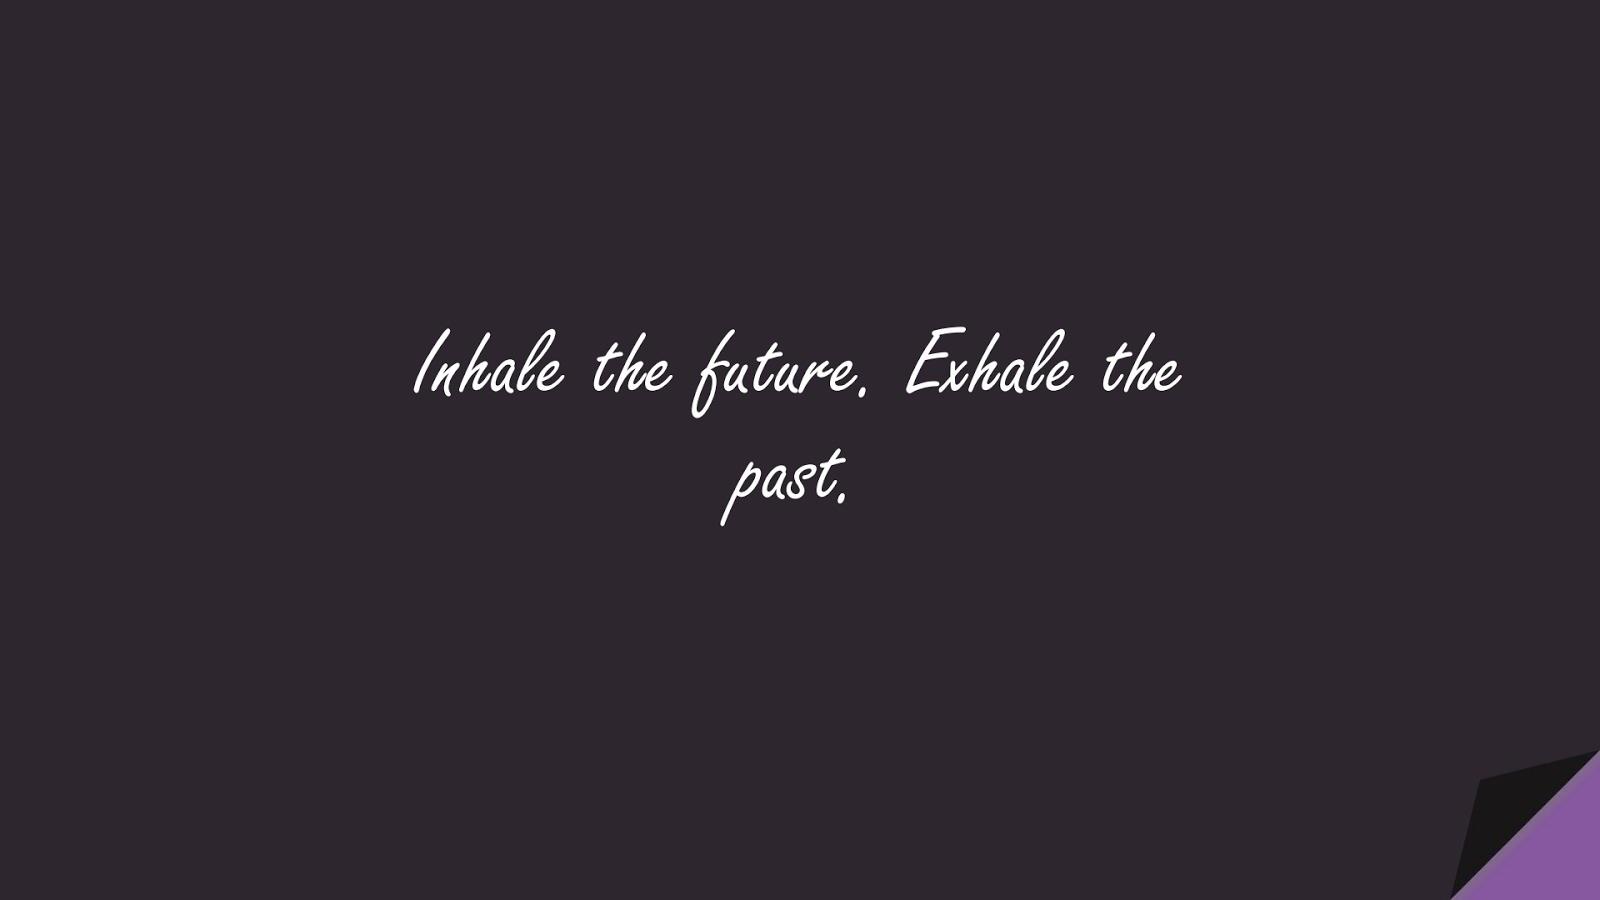 Inhale the future. Exhale the past.FALSE